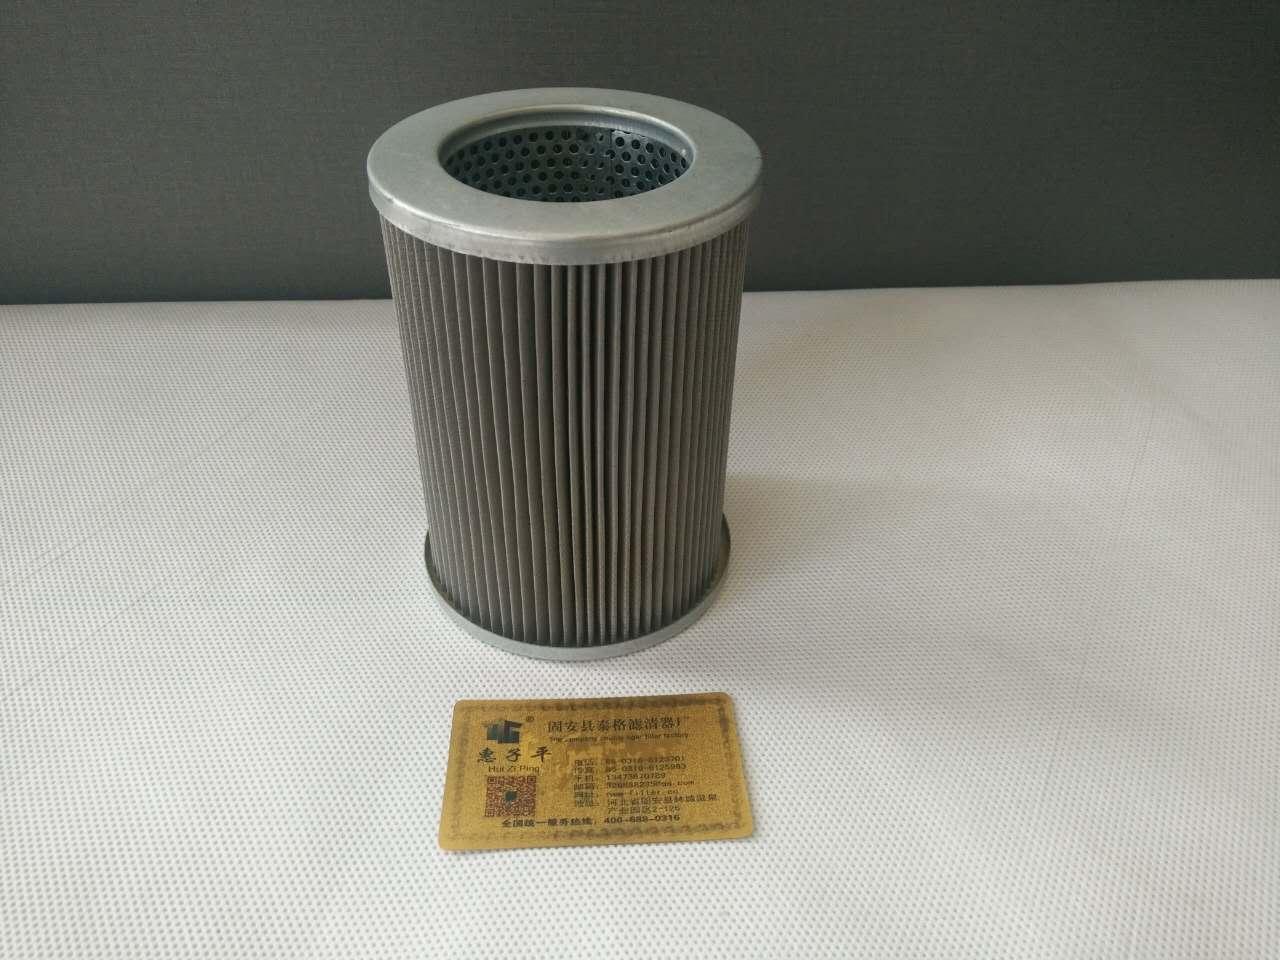 TR-21461 RRR粗滤芯 3r粗滤芯 滤油机滤芯 不锈钢滤芯